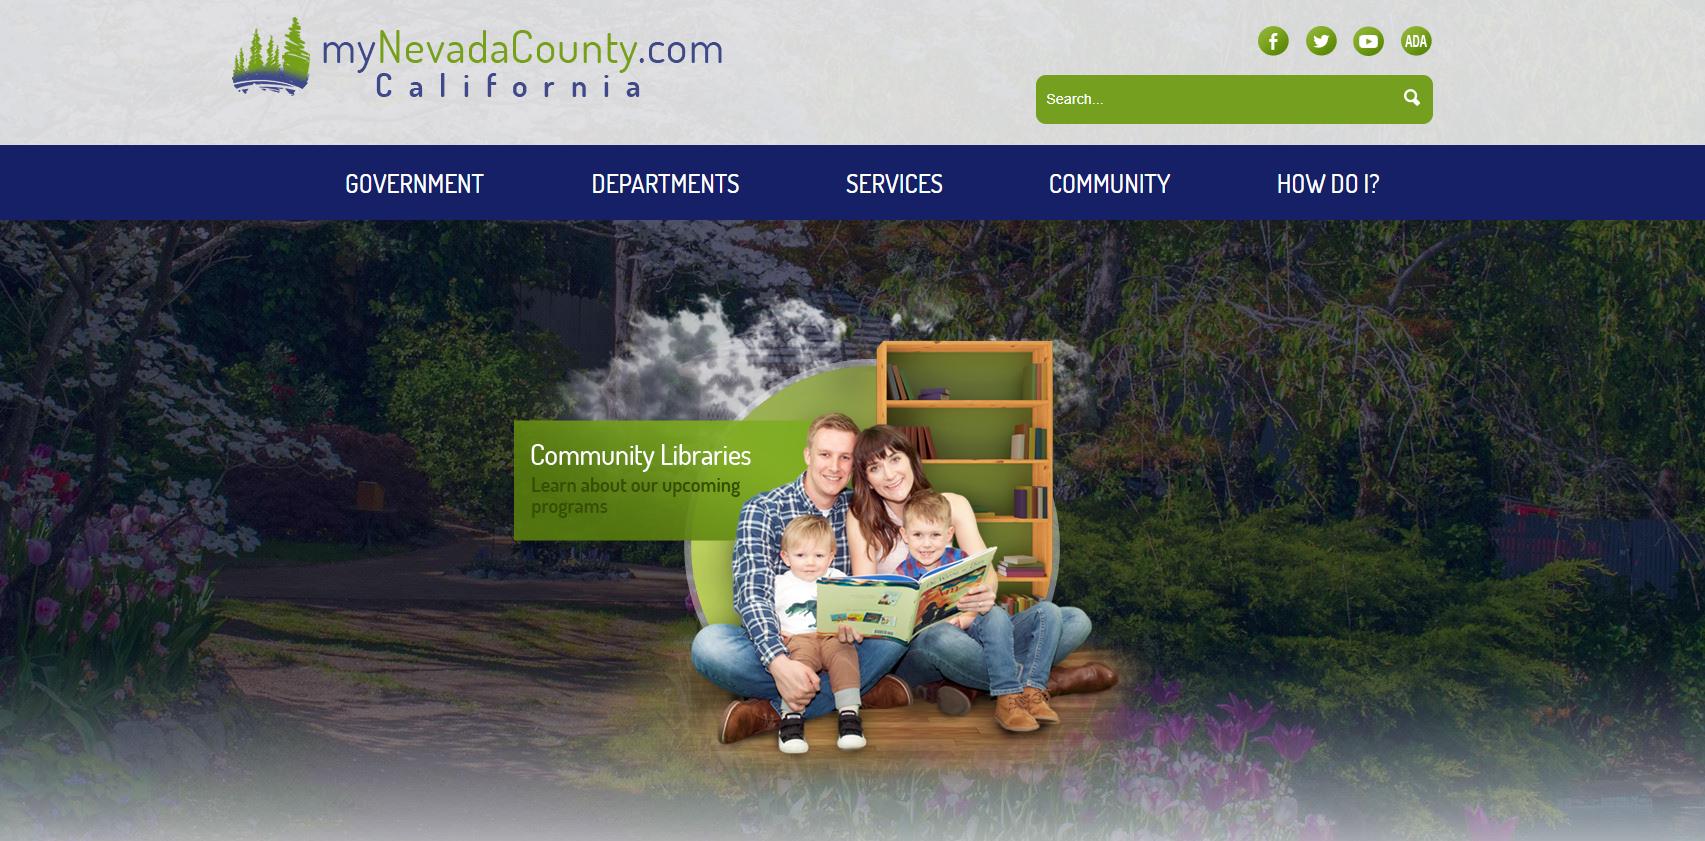 Nevada_County_CA_2018_Digital_Counties_Award_Winner